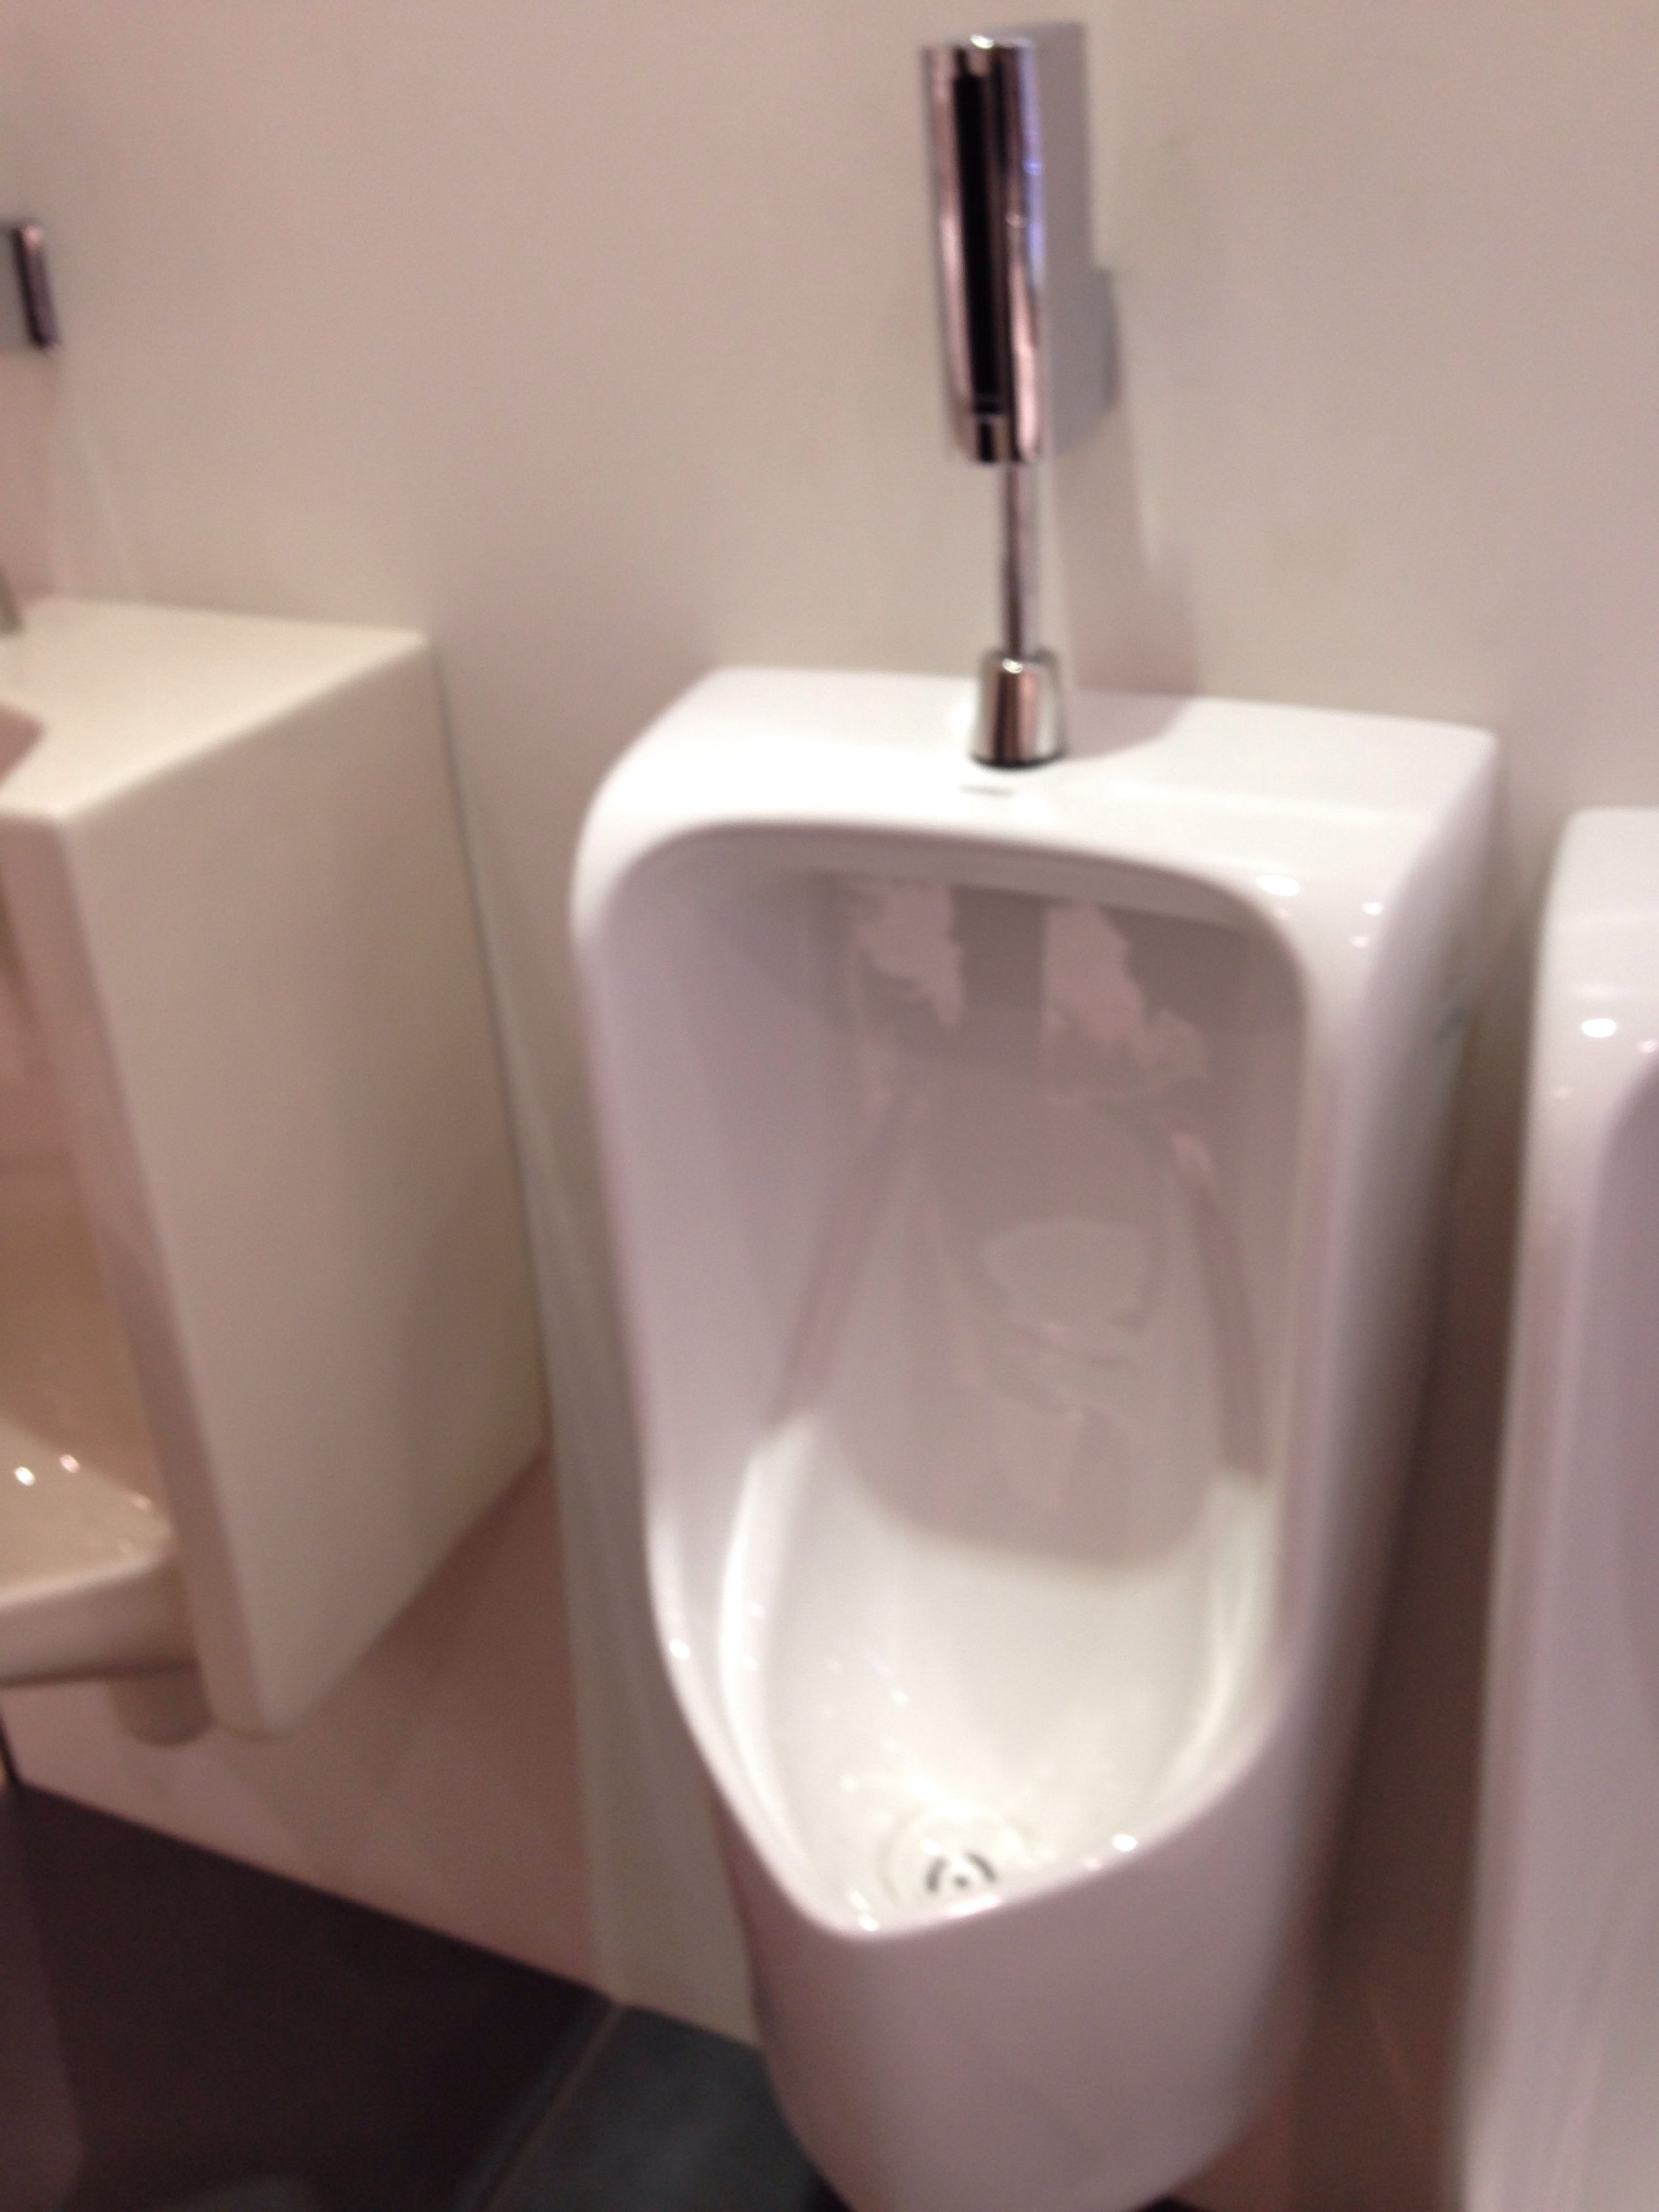 toto urinal 3 (center), rmb1558